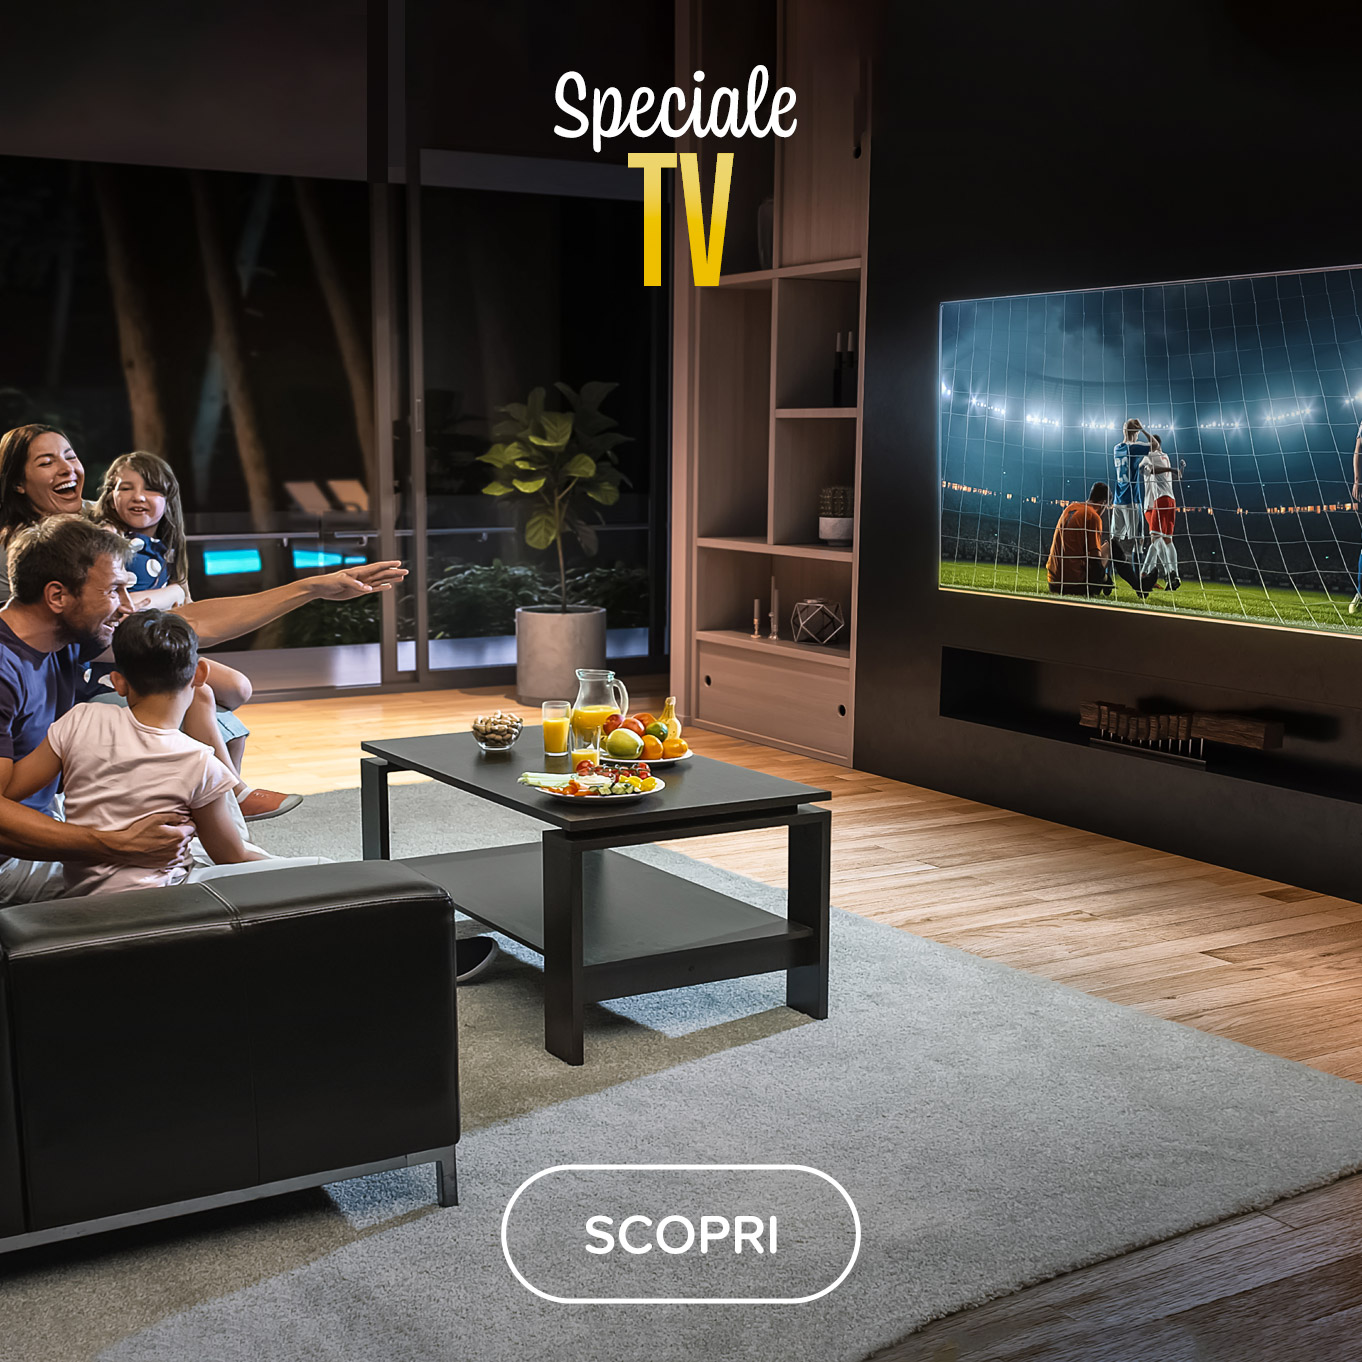 Speciale TV